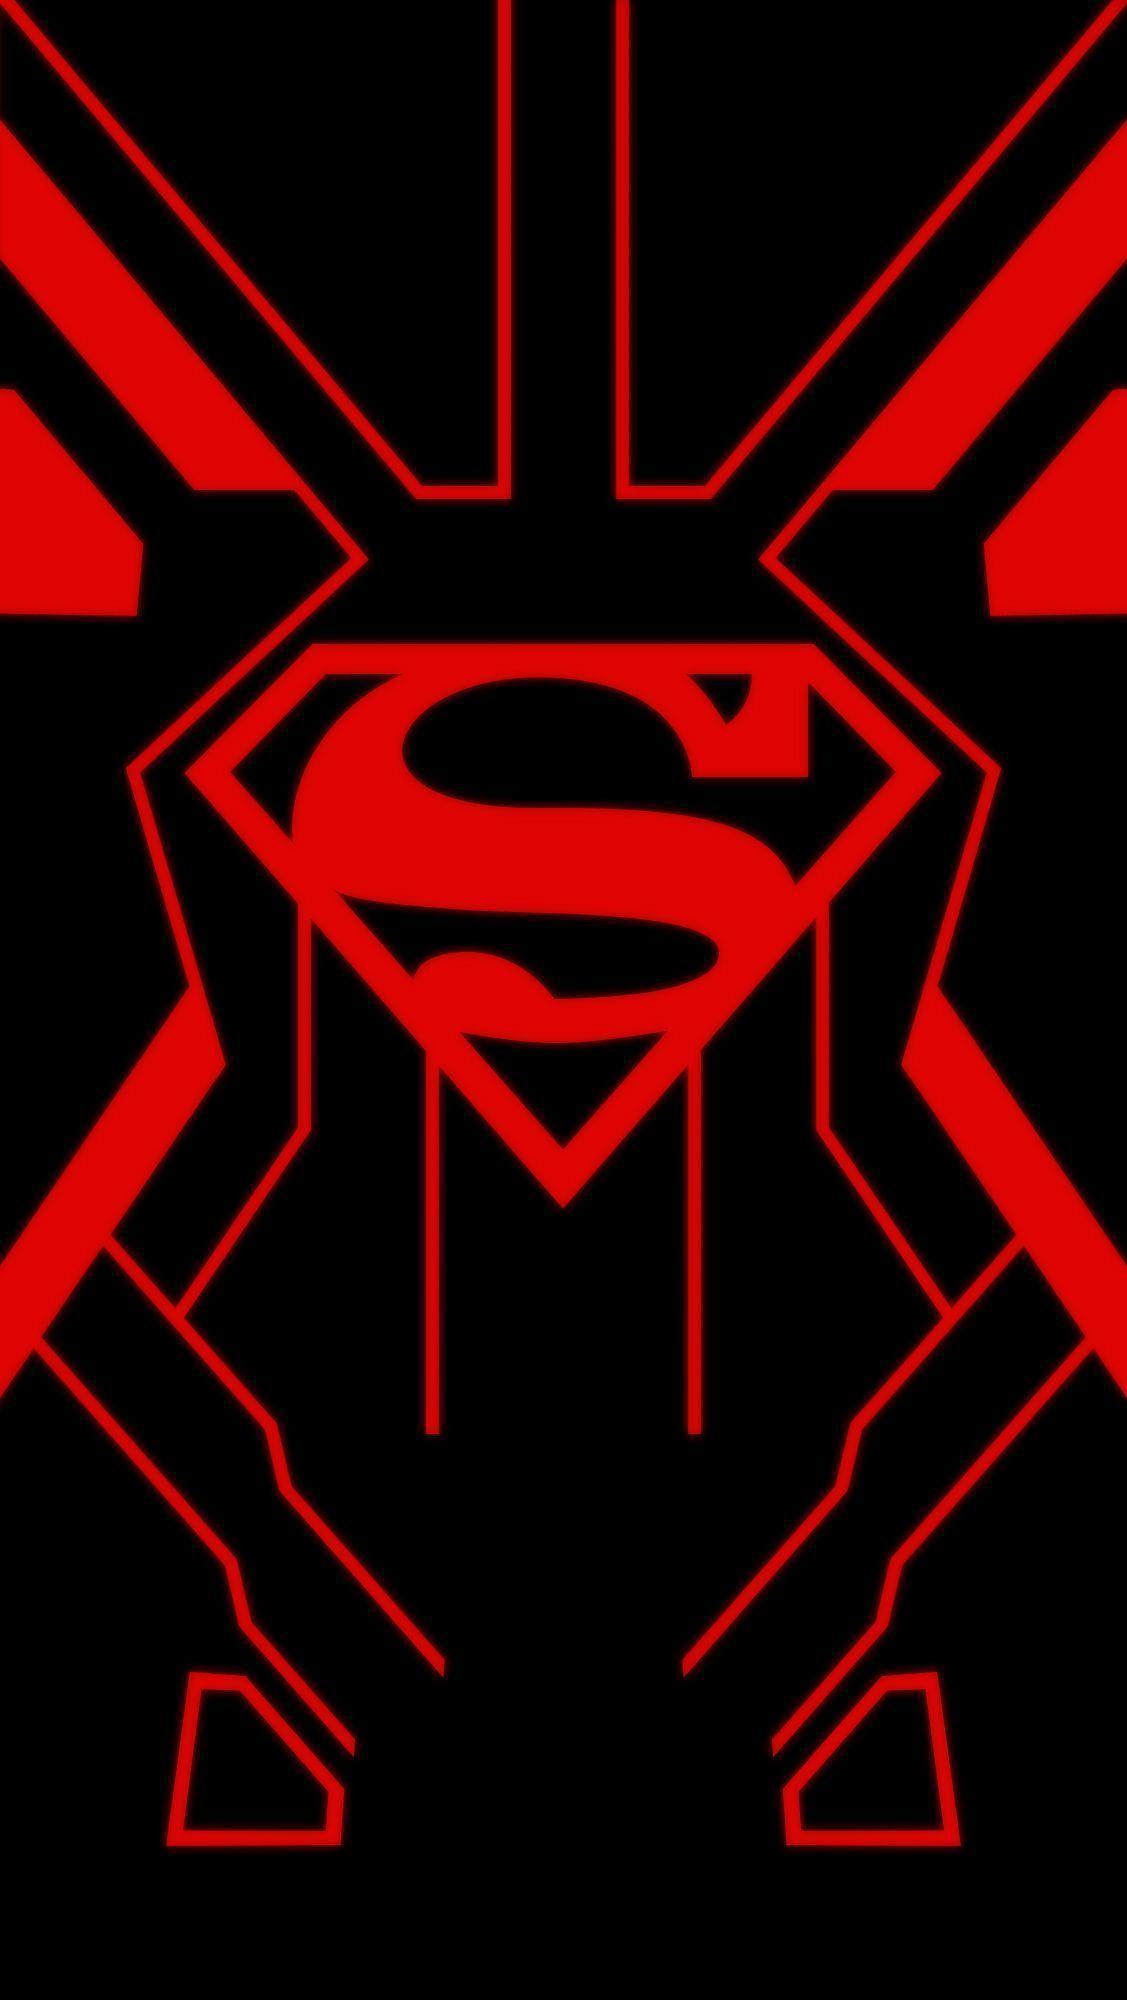 Under Armour 3d Wallpaper Superboy Wallpapers Wallpaper Cave